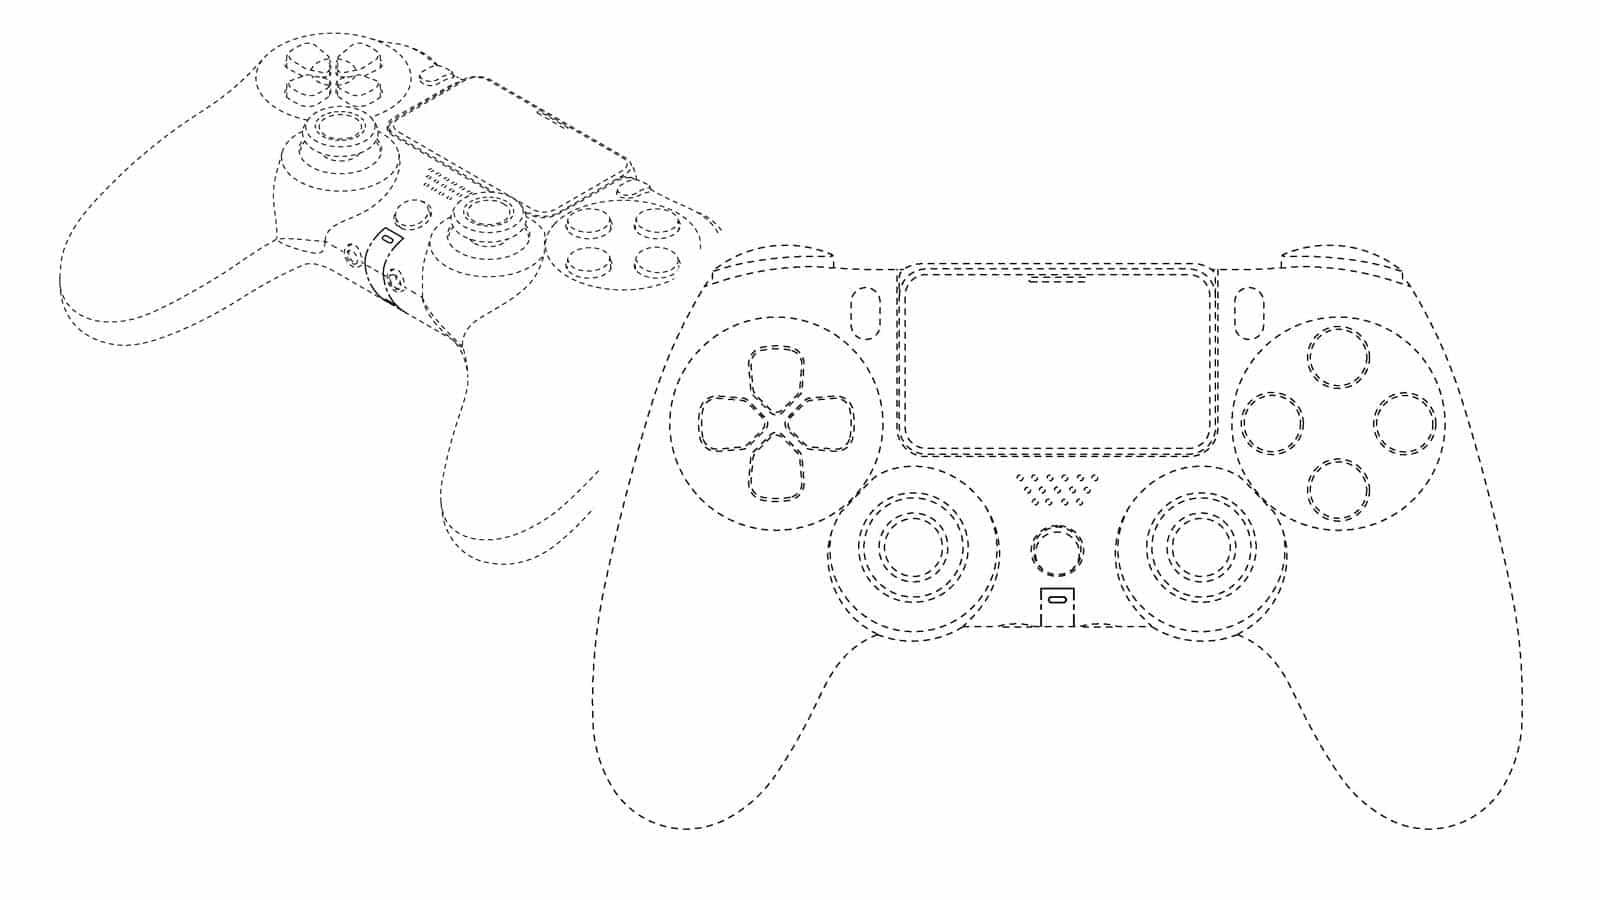 sony playstation 5 controller dualshock 5